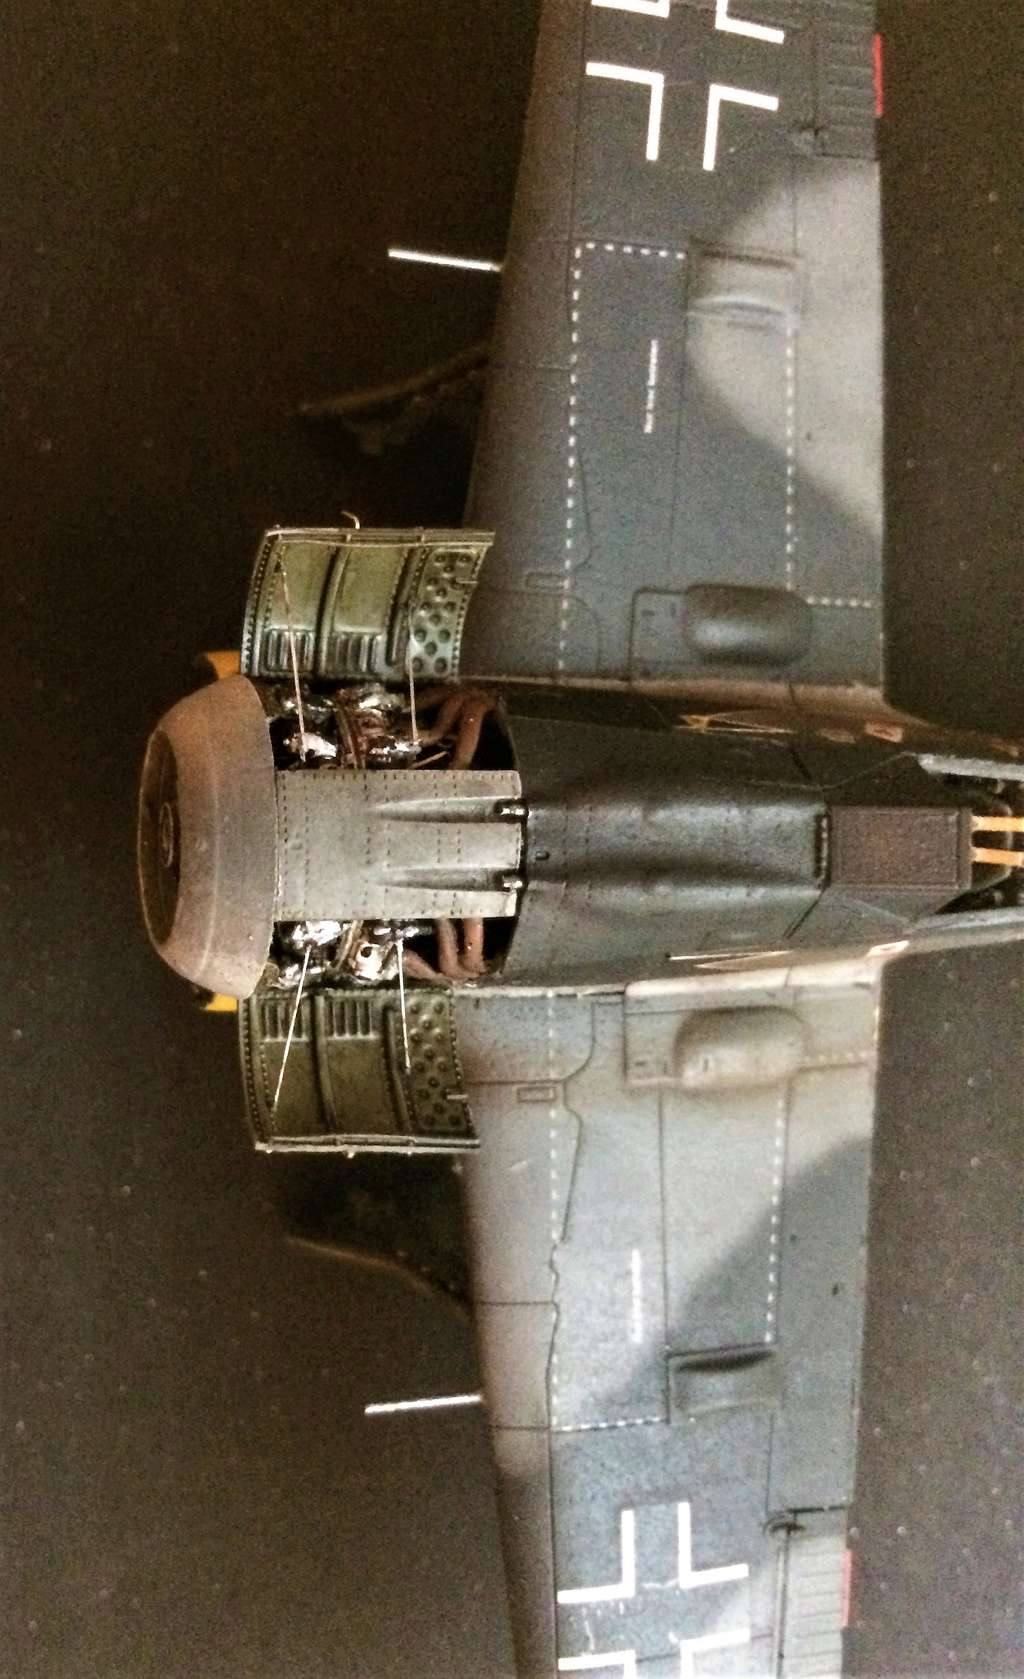 FW 190A8 - EDUARD ROYAL CLASS + Brassin -1/72 + projet diorama (Trois avions terminés) - Page 2 Img_7446